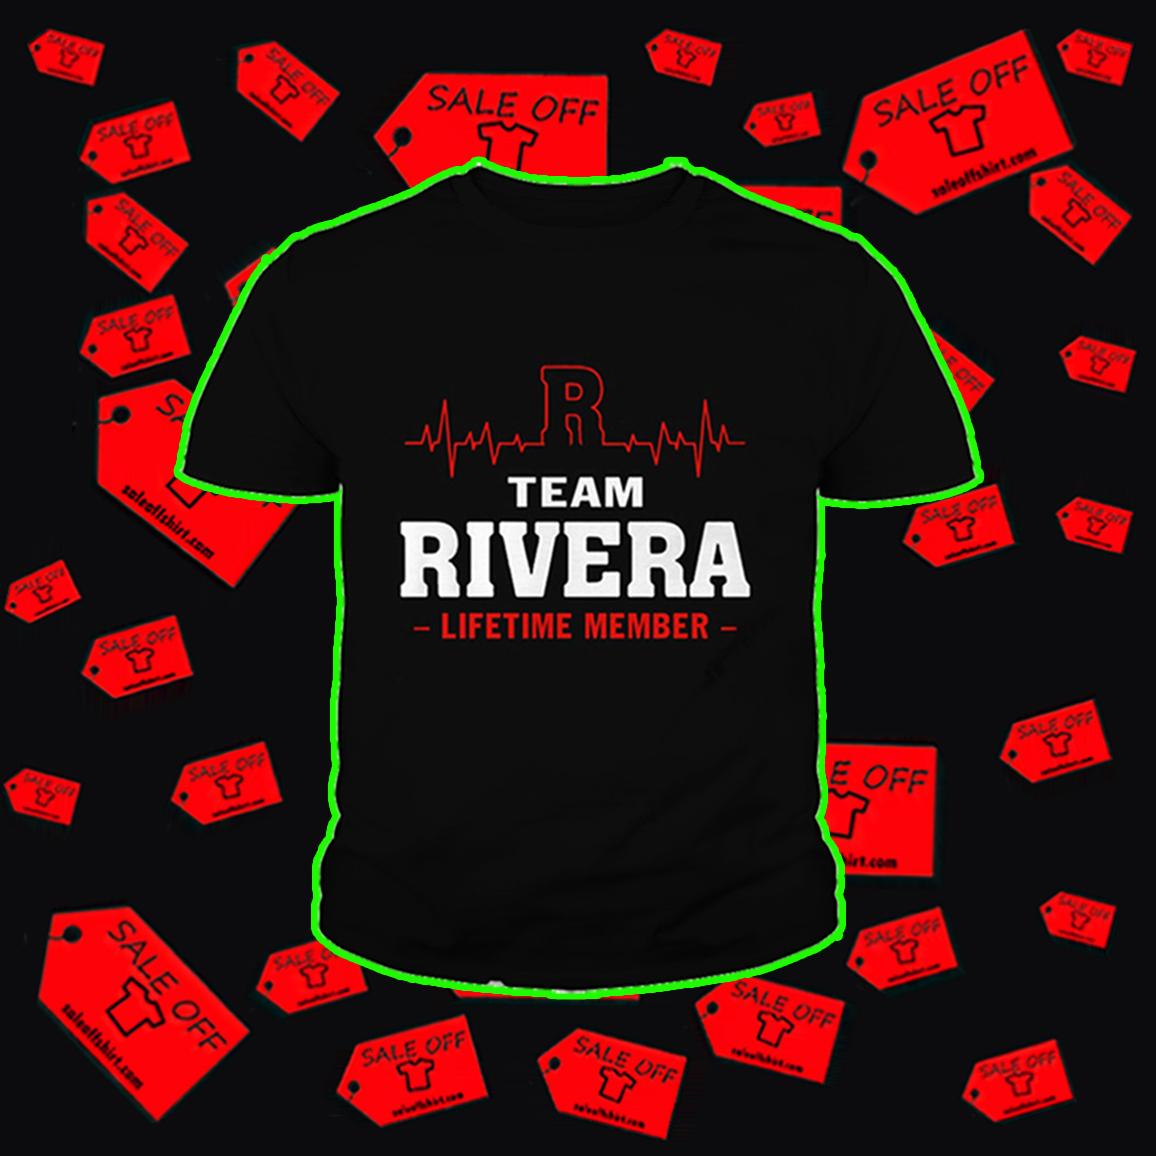 Team Rivera lifetime member shirt